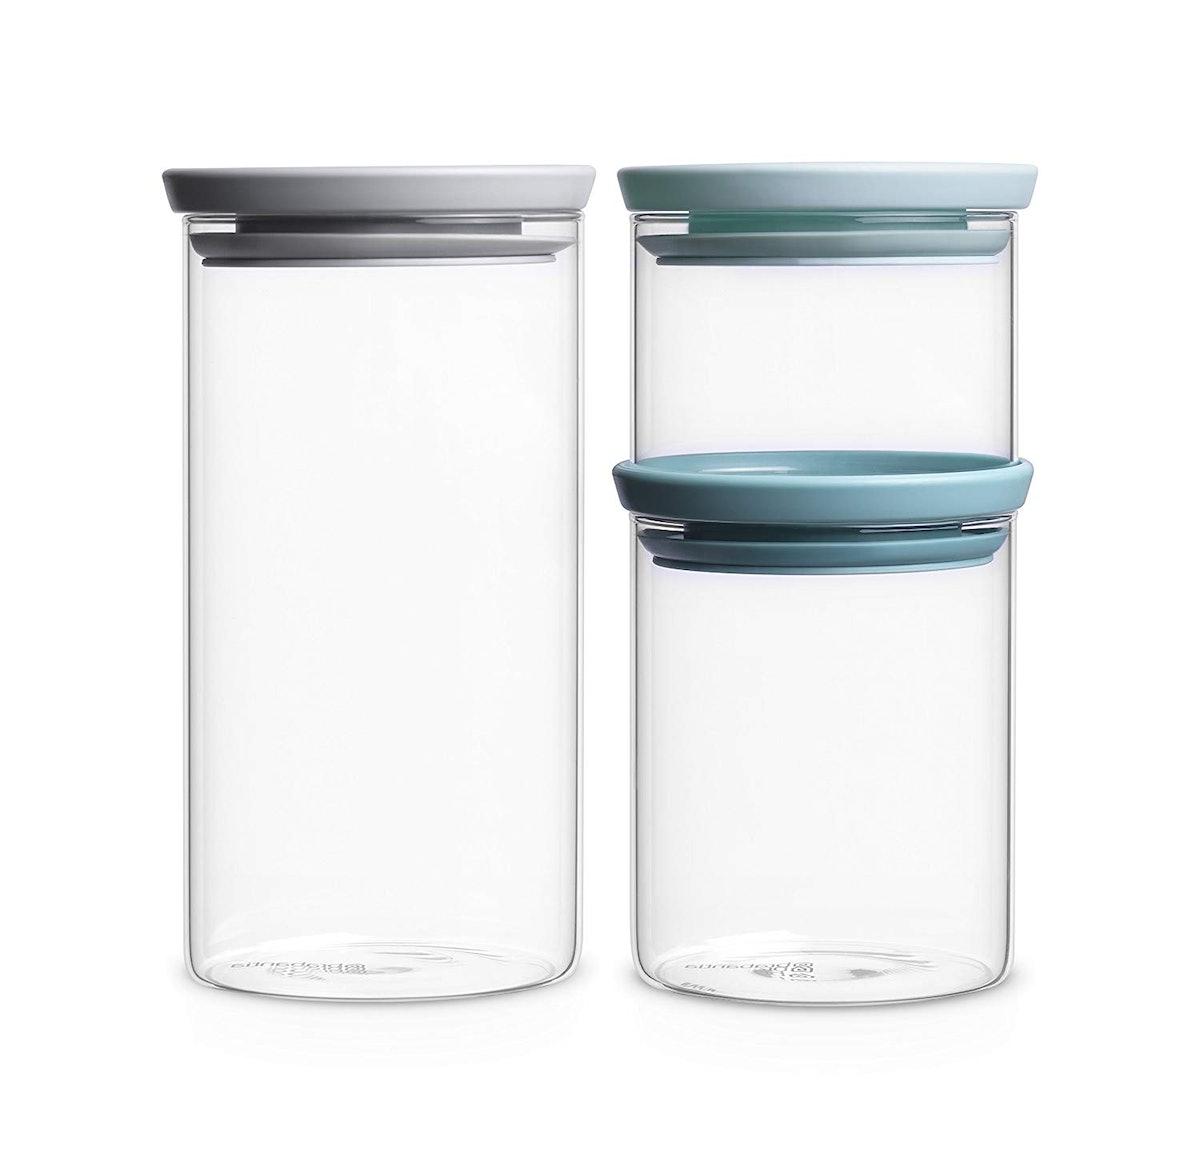 Brabantia Storage Containers (Set of 3)